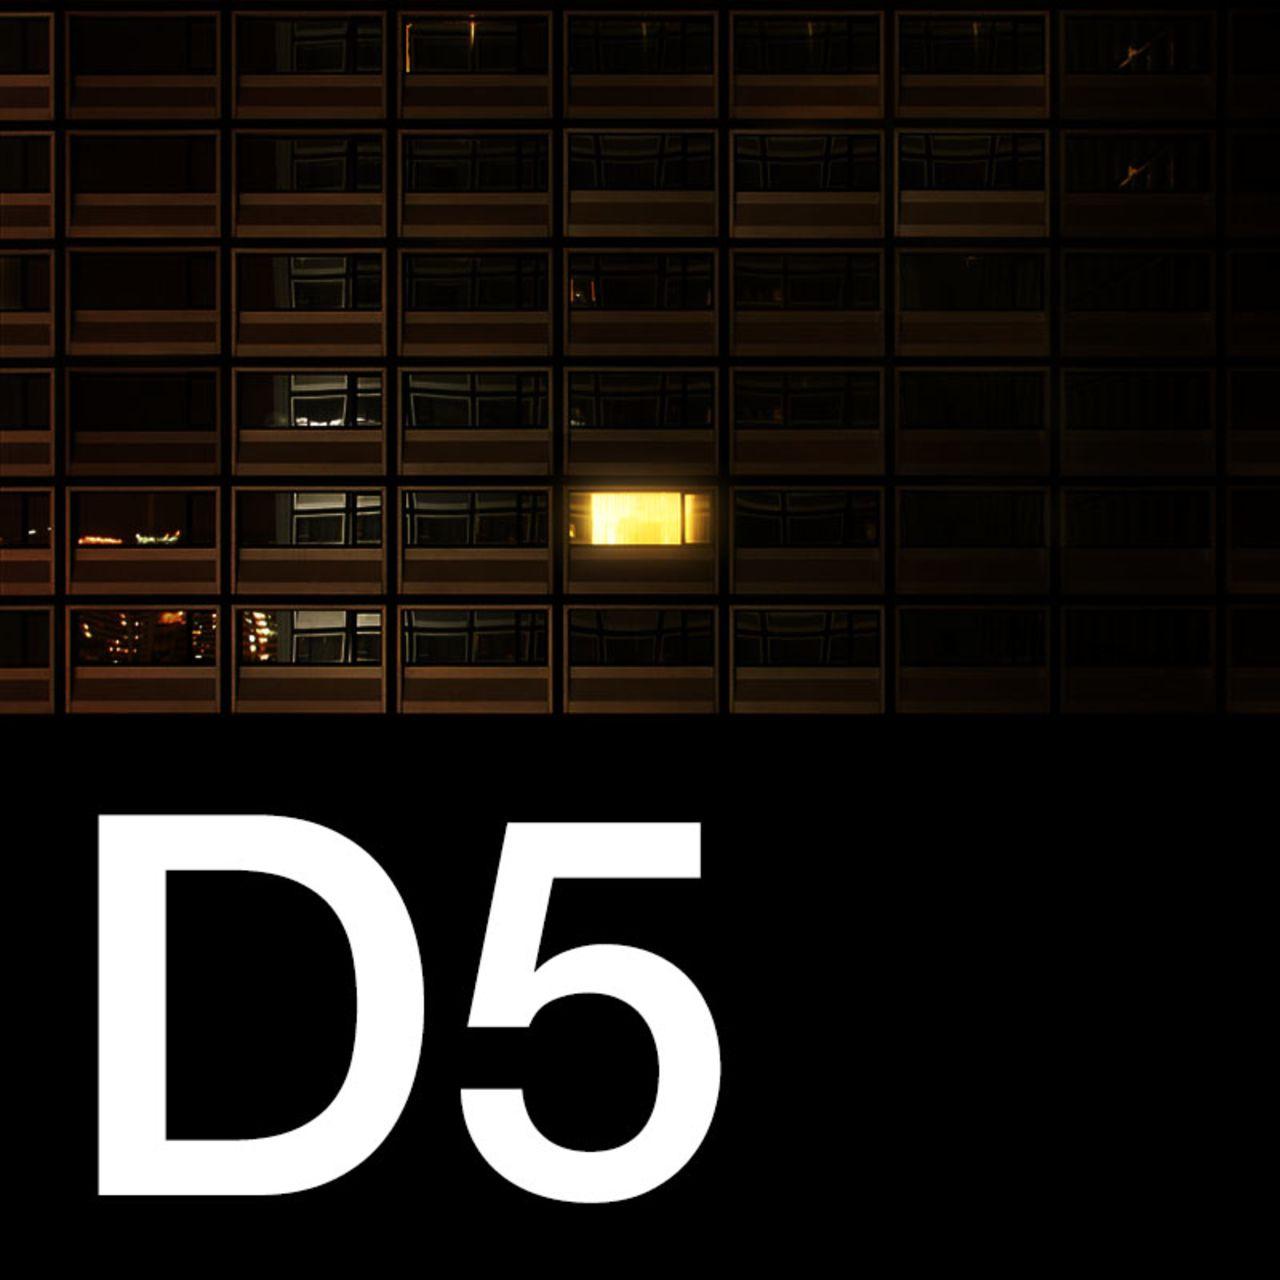 Apartment D5